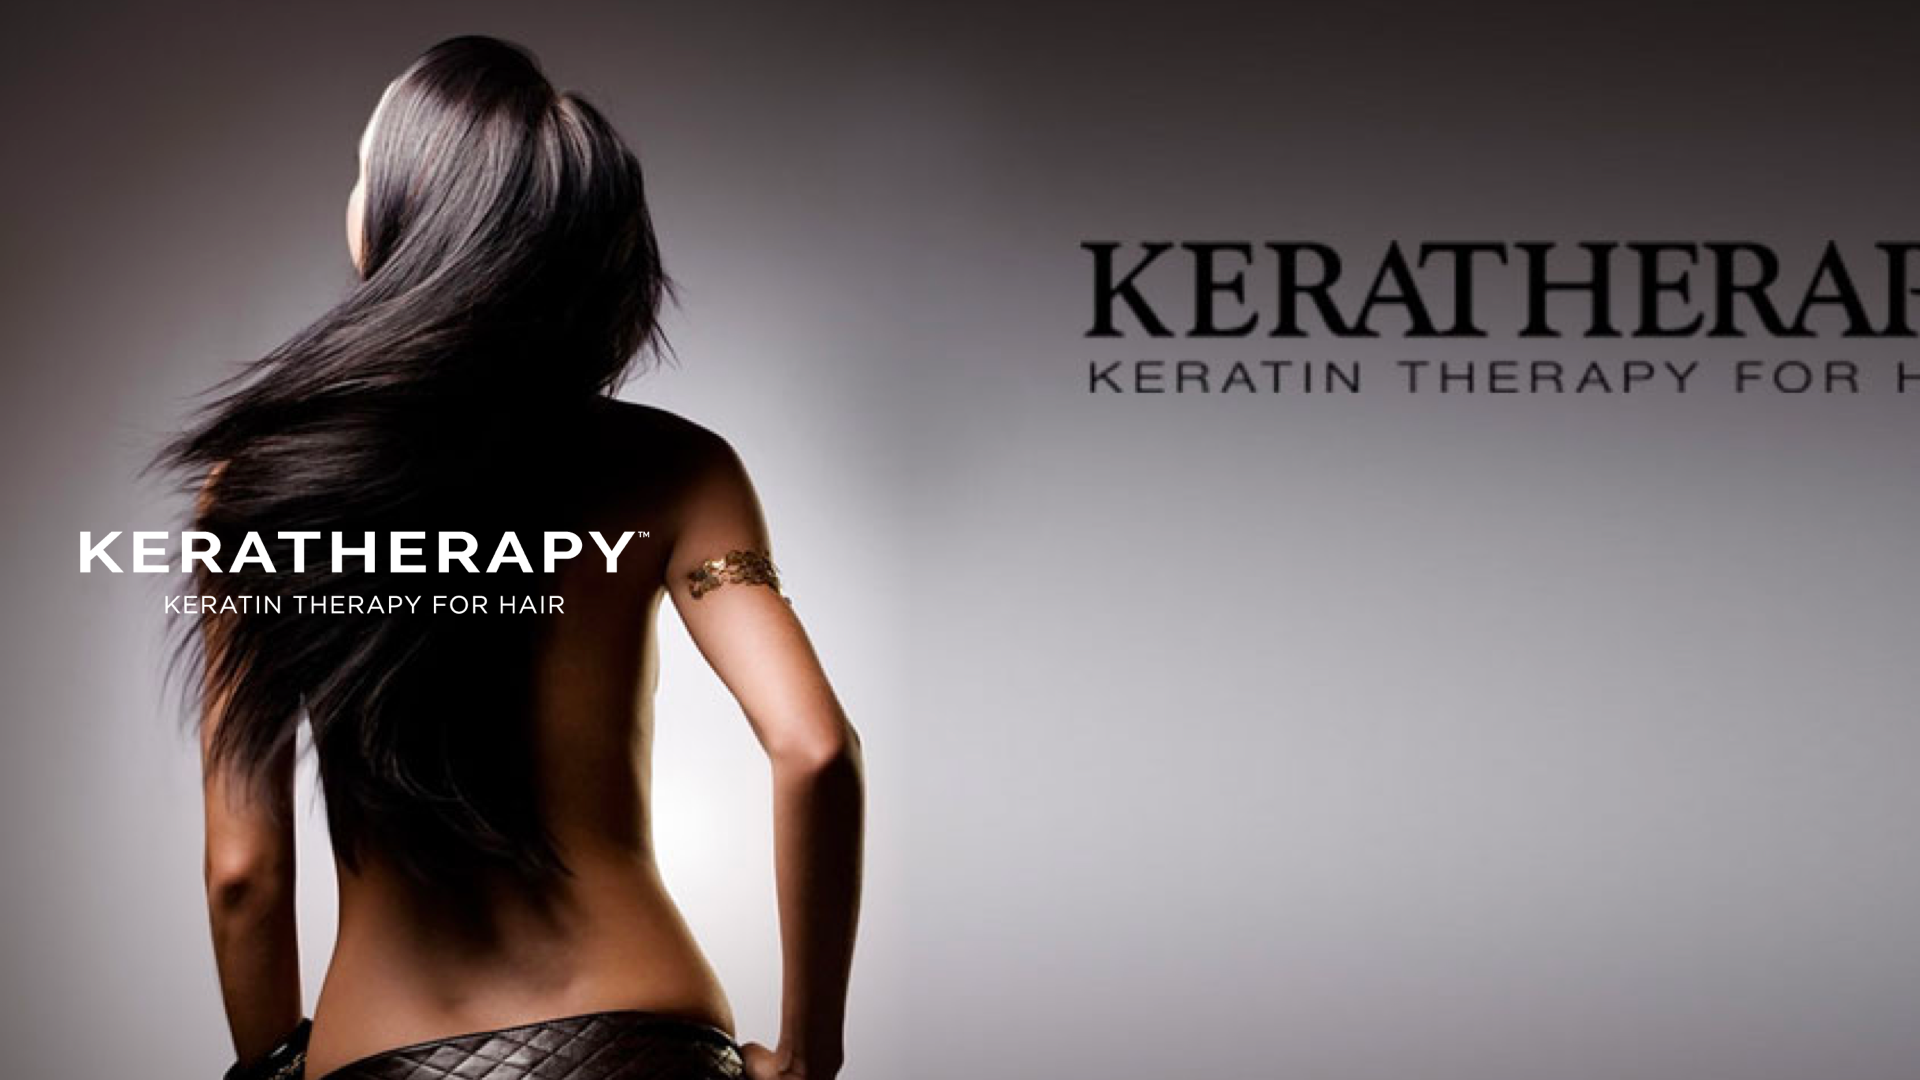 Keratherapy keratine